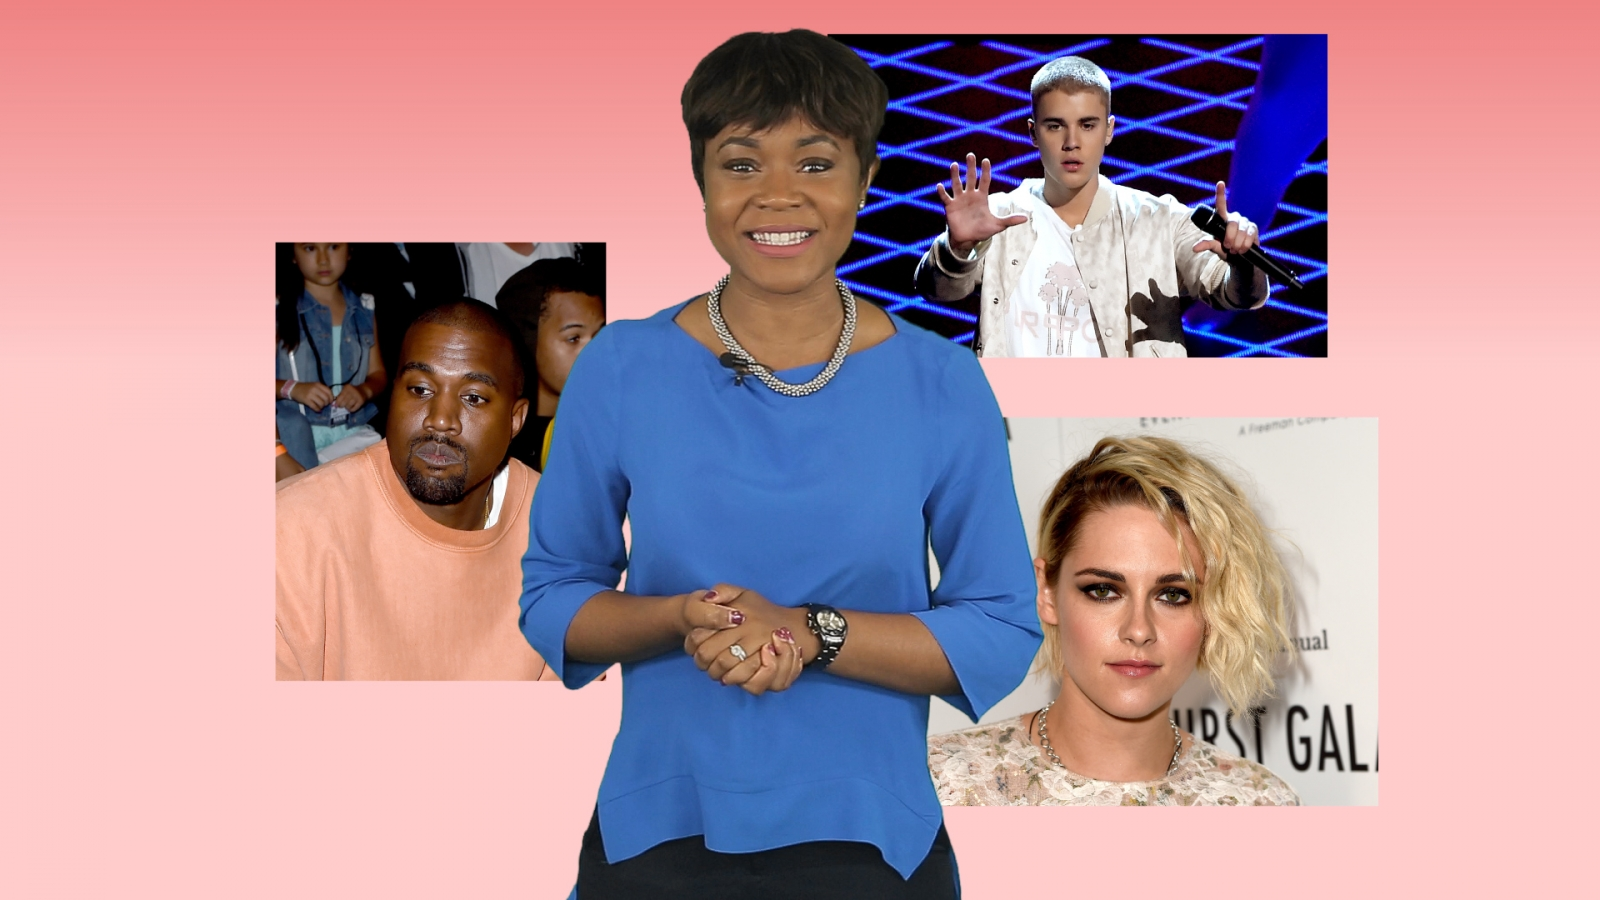 A-List Insider: Justin Bieber quits Instagram, Kanye West tipped to headline Super Bowl 51 halftime show